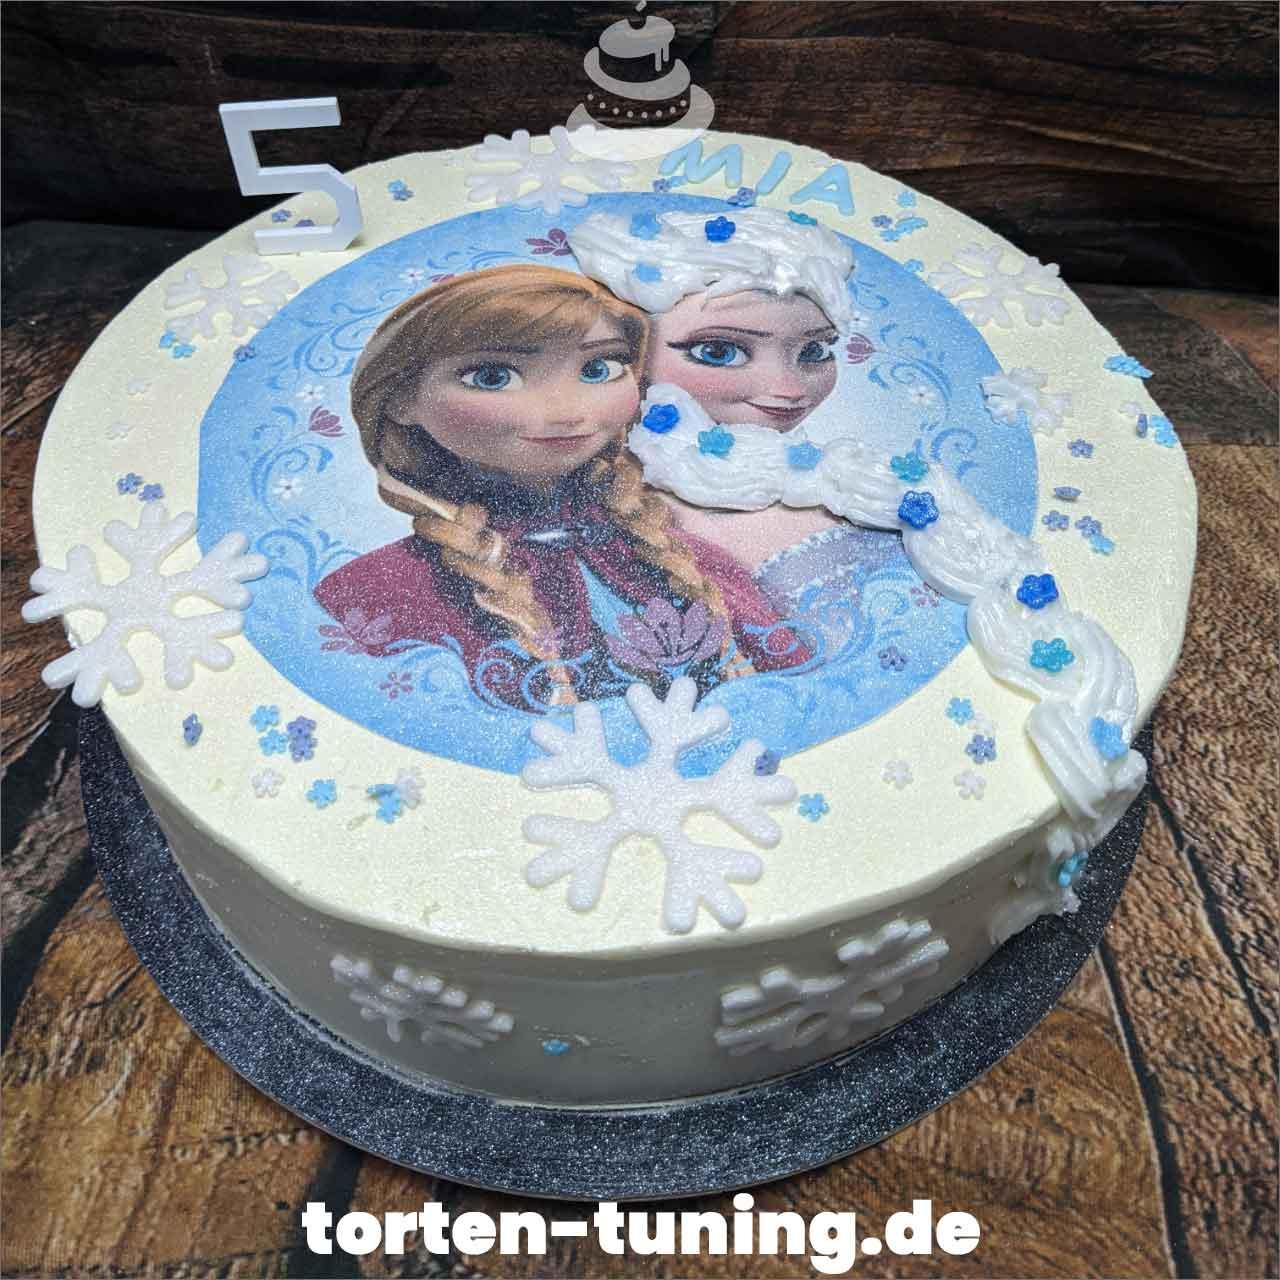 Elsa Obsttorte Geburtstagstorte Motivtorte Torte Tortendekoration Torte online bestellen Suhl Thüringen Torten Tuning Sahnetorte Tortenfiguren Cake Topper